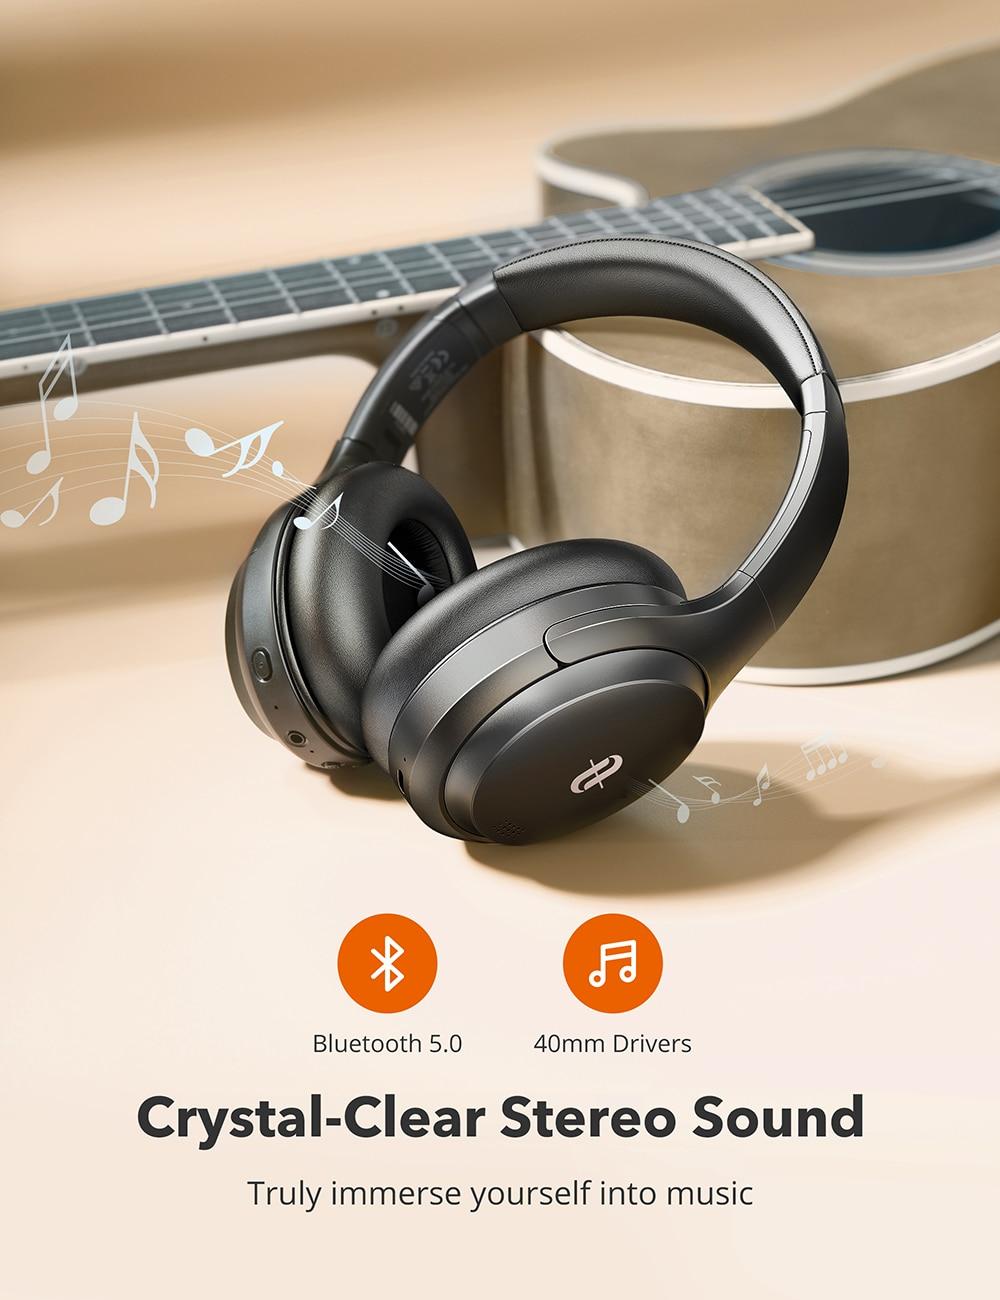 TaoTronics Bluetooth Headphones SoundLiberty 90 Hybrid Active Noise Cancelling Headphone ANC Hifi Wireless Headset with Mic enlarge